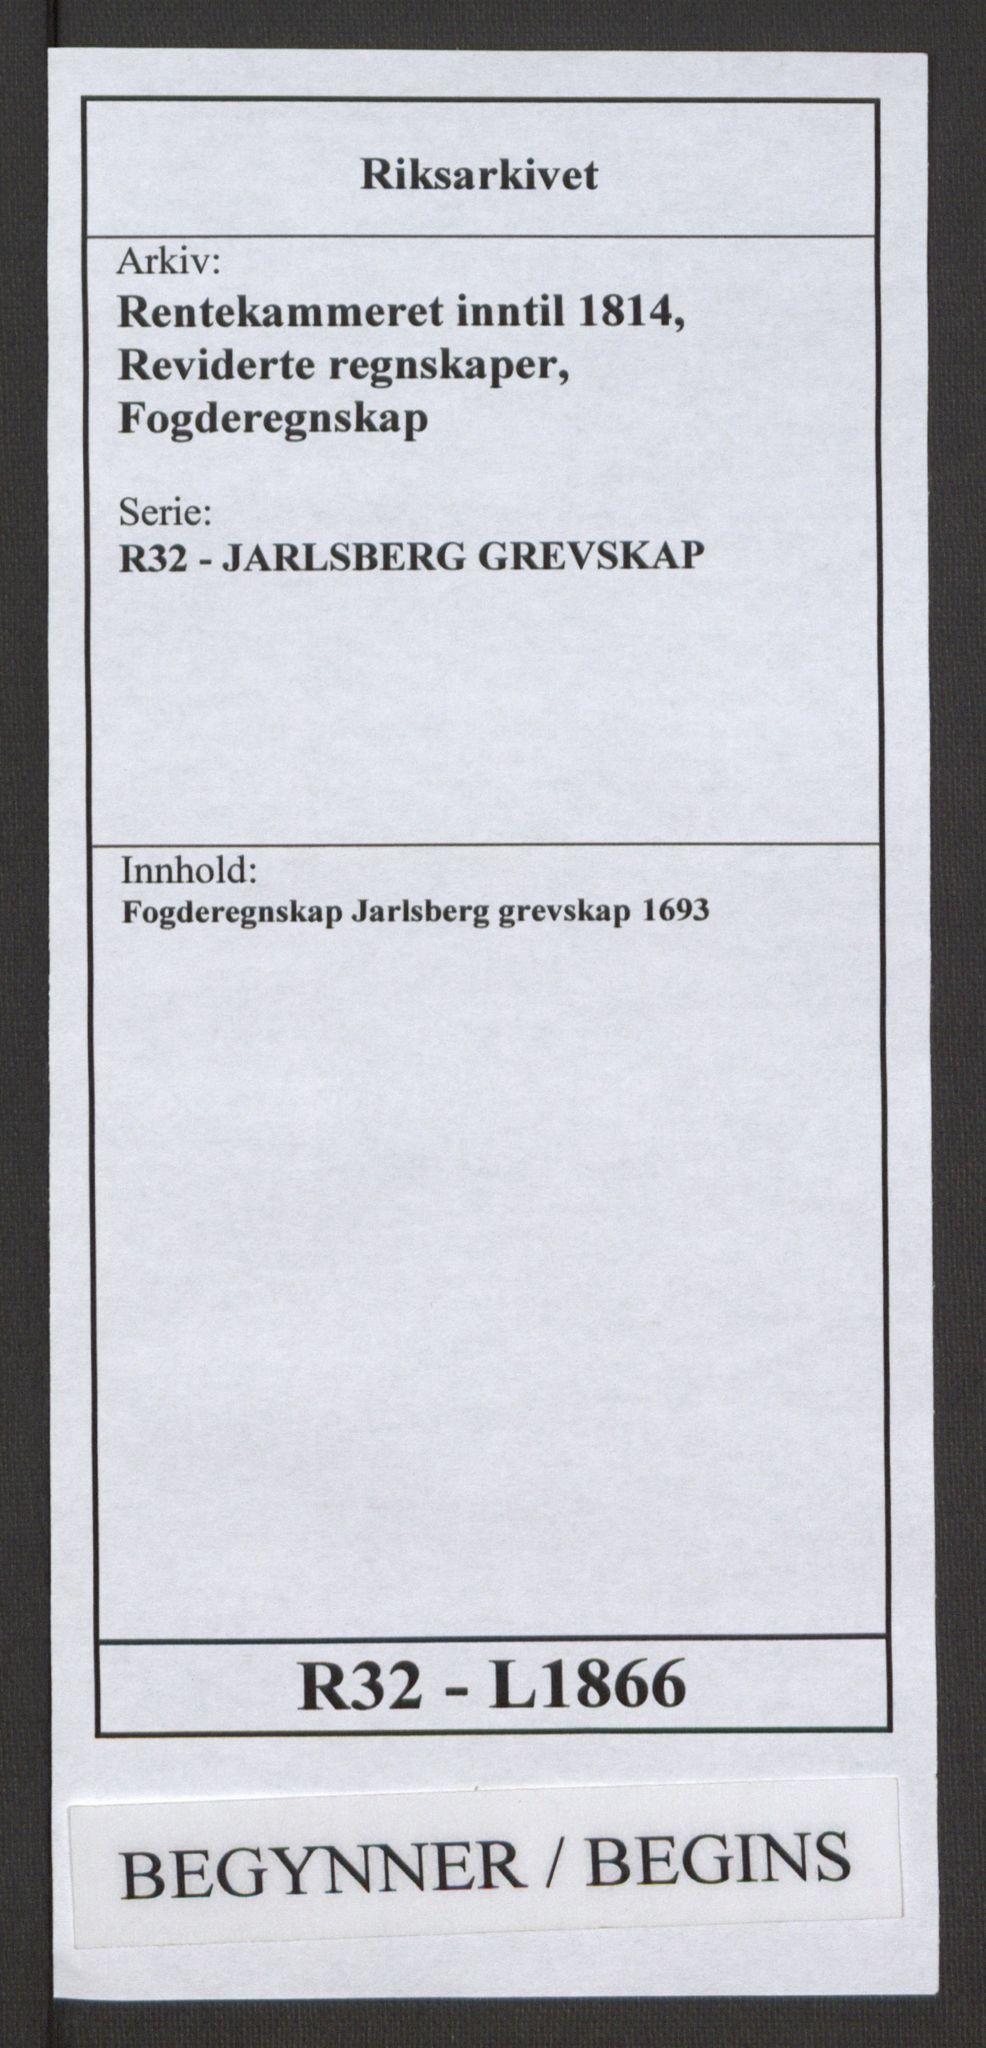 RA, Rentekammeret inntil 1814, Reviderte regnskaper, Fogderegnskap, R32/L1866: Fogderegnskap Jarlsberg grevskap, 1693, s. 1